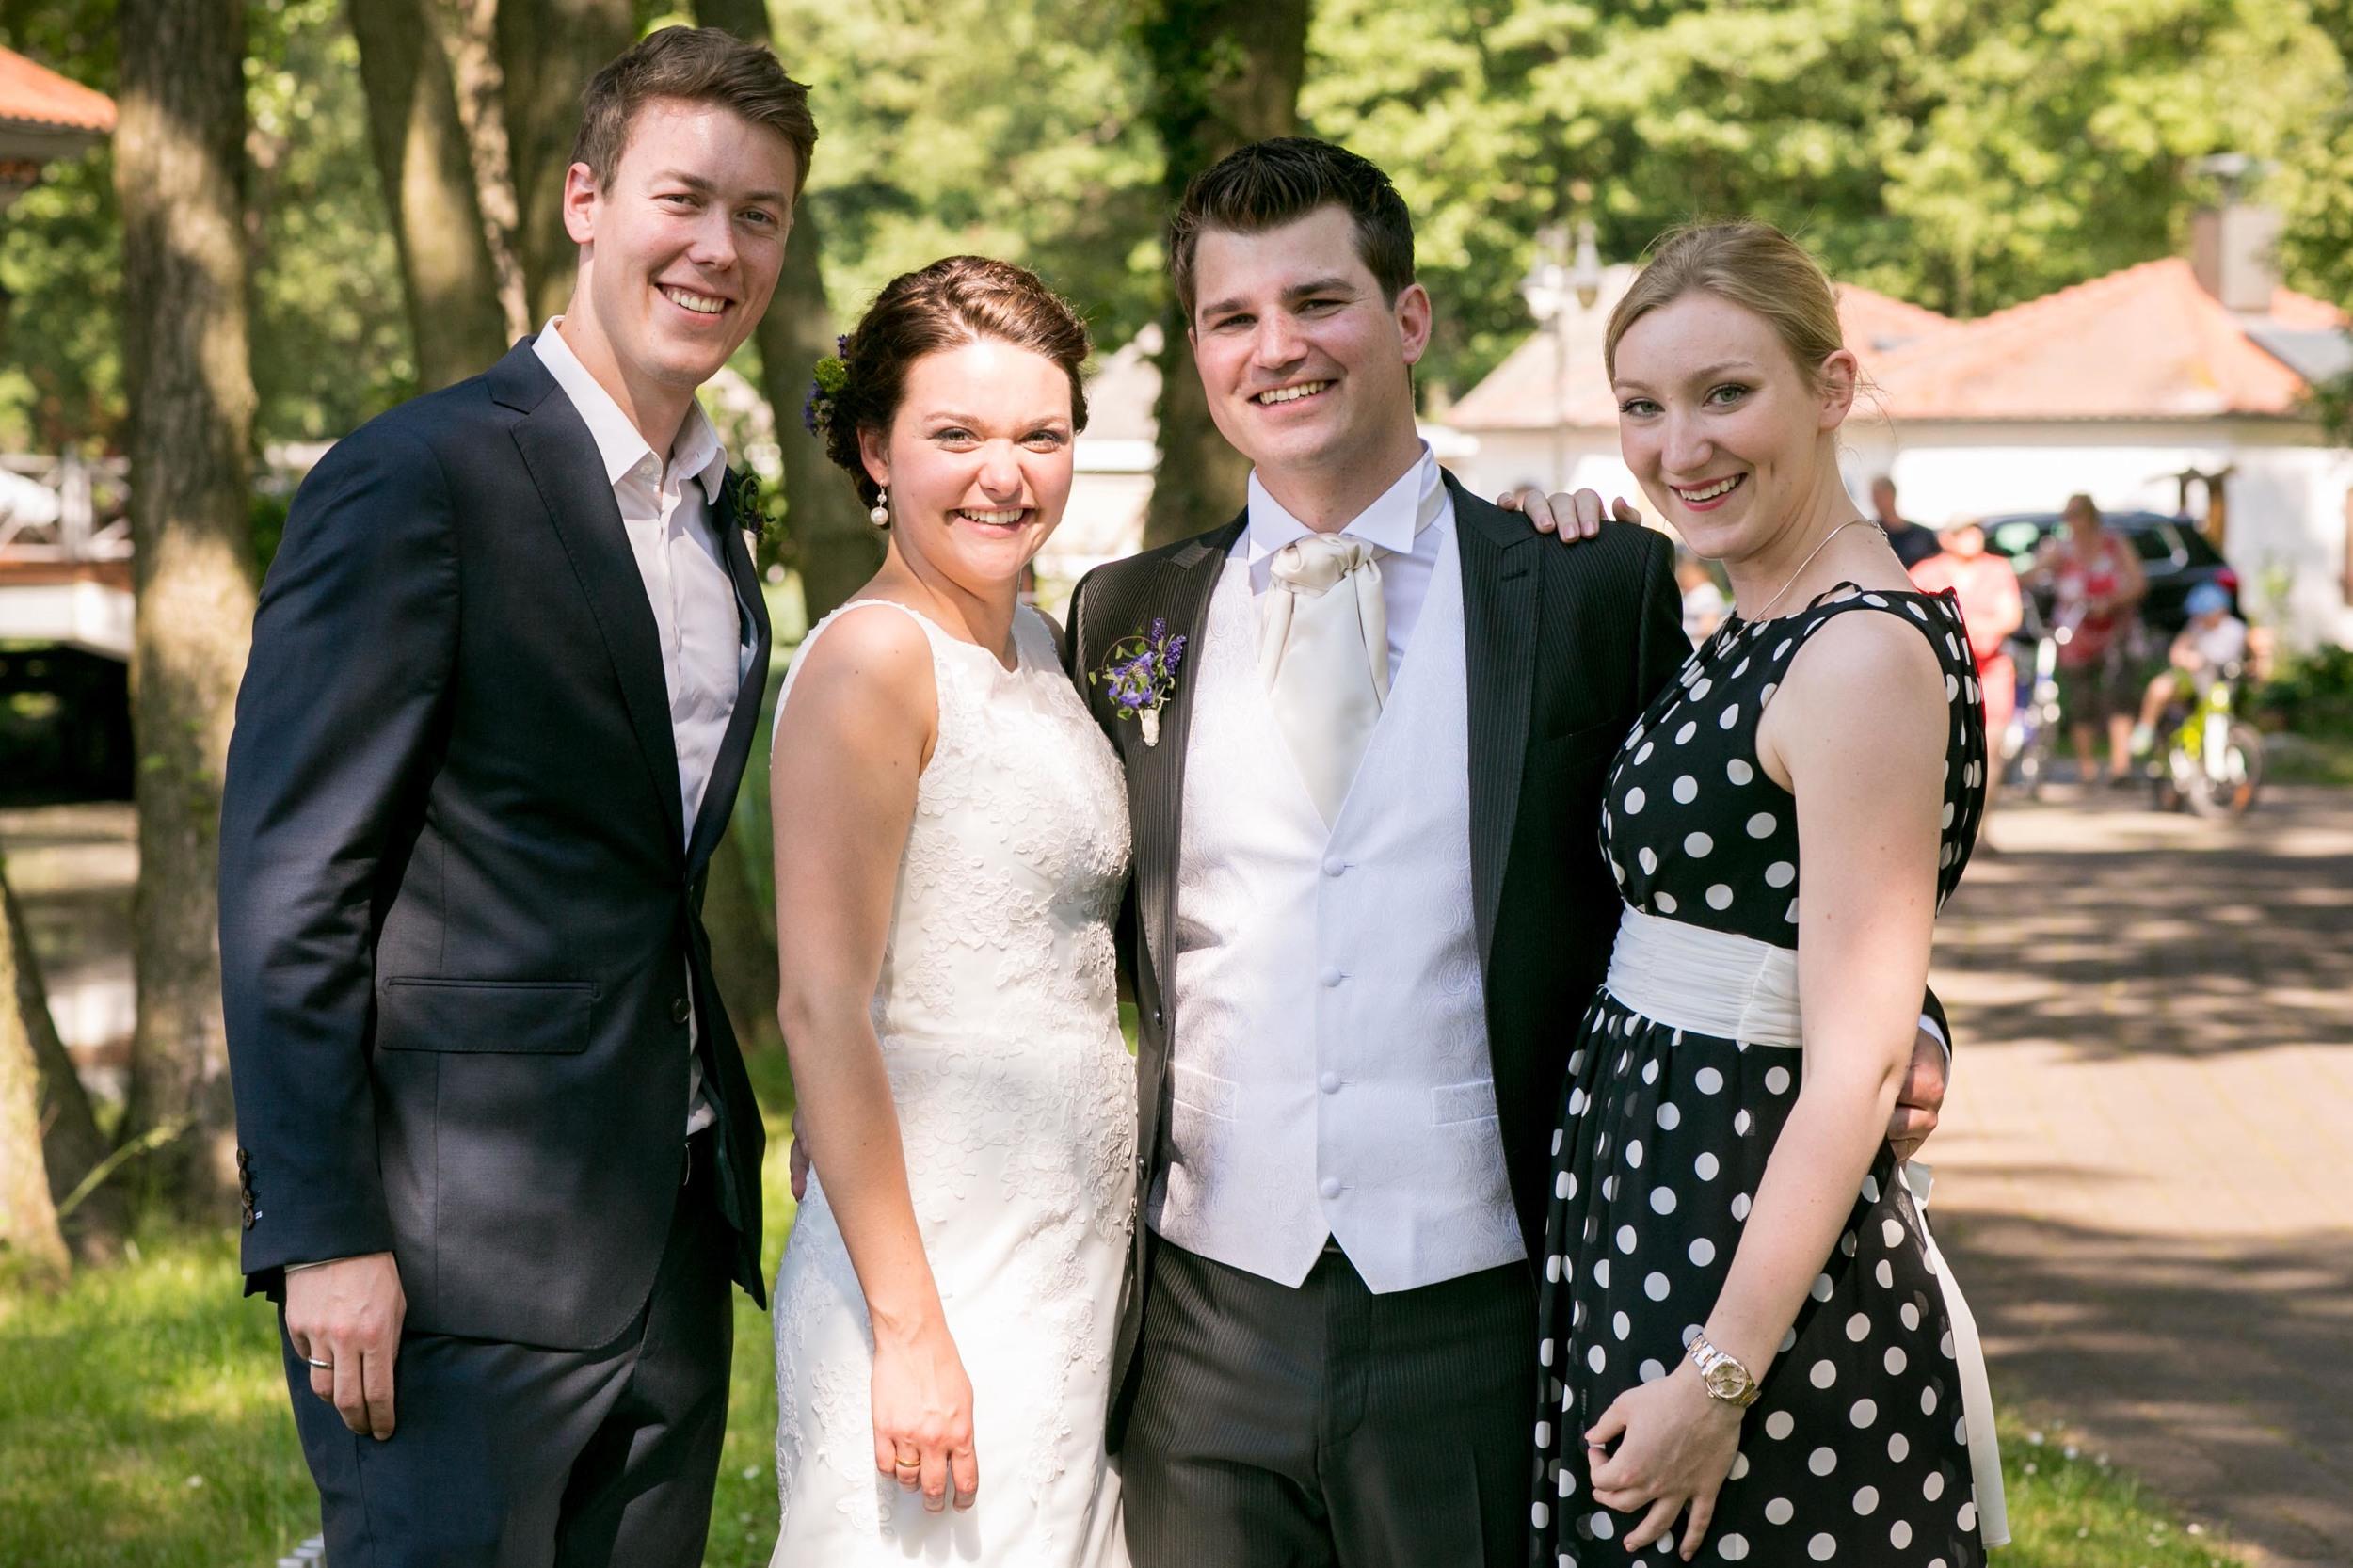 Hochzeitsfotografie Berlin_Fran Burrows Fotografie-341.jpg